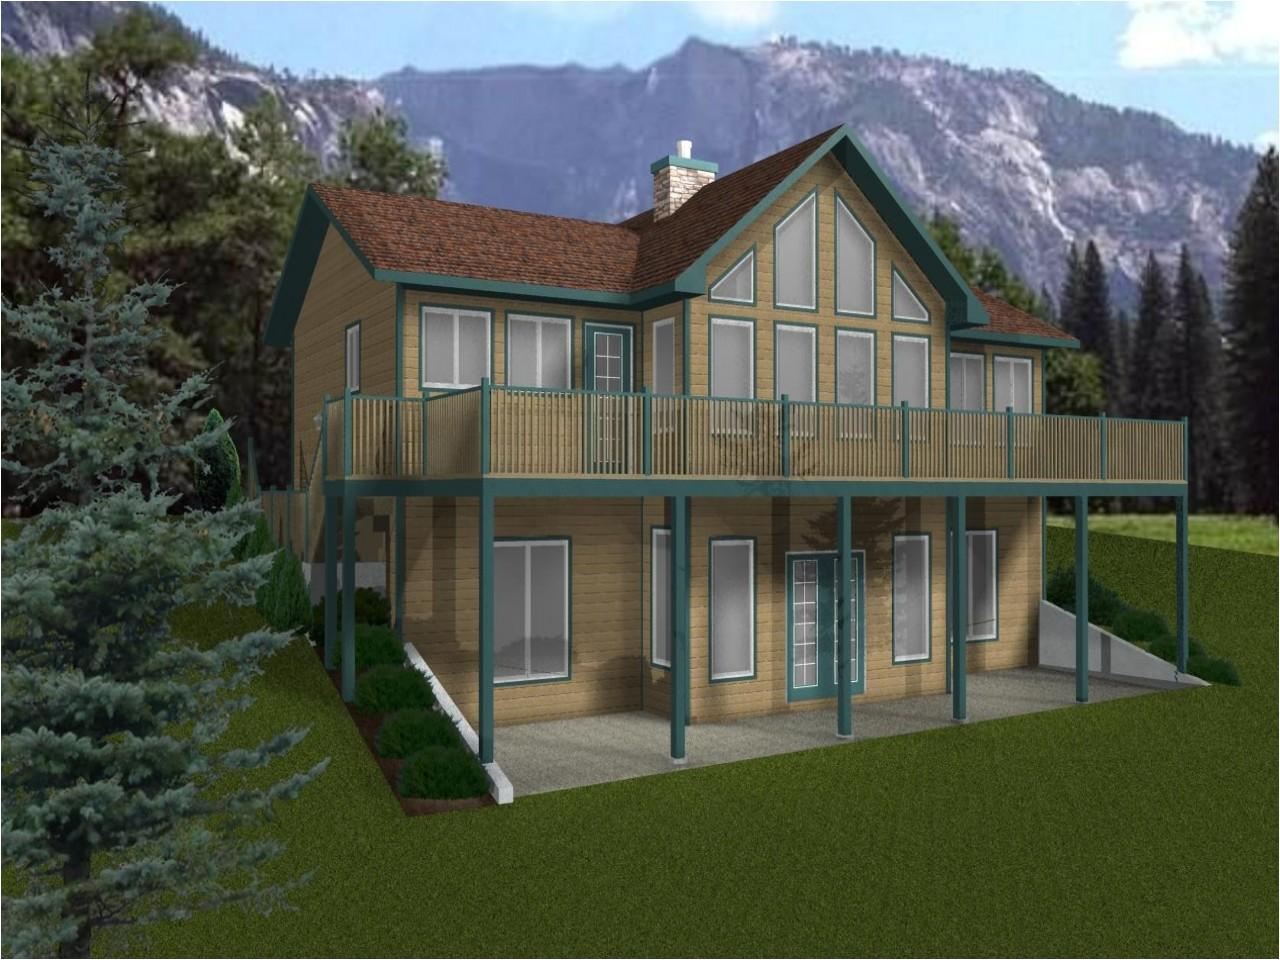 c035a4352eef9448 house plans with walkout basement walk out basement cabin plans